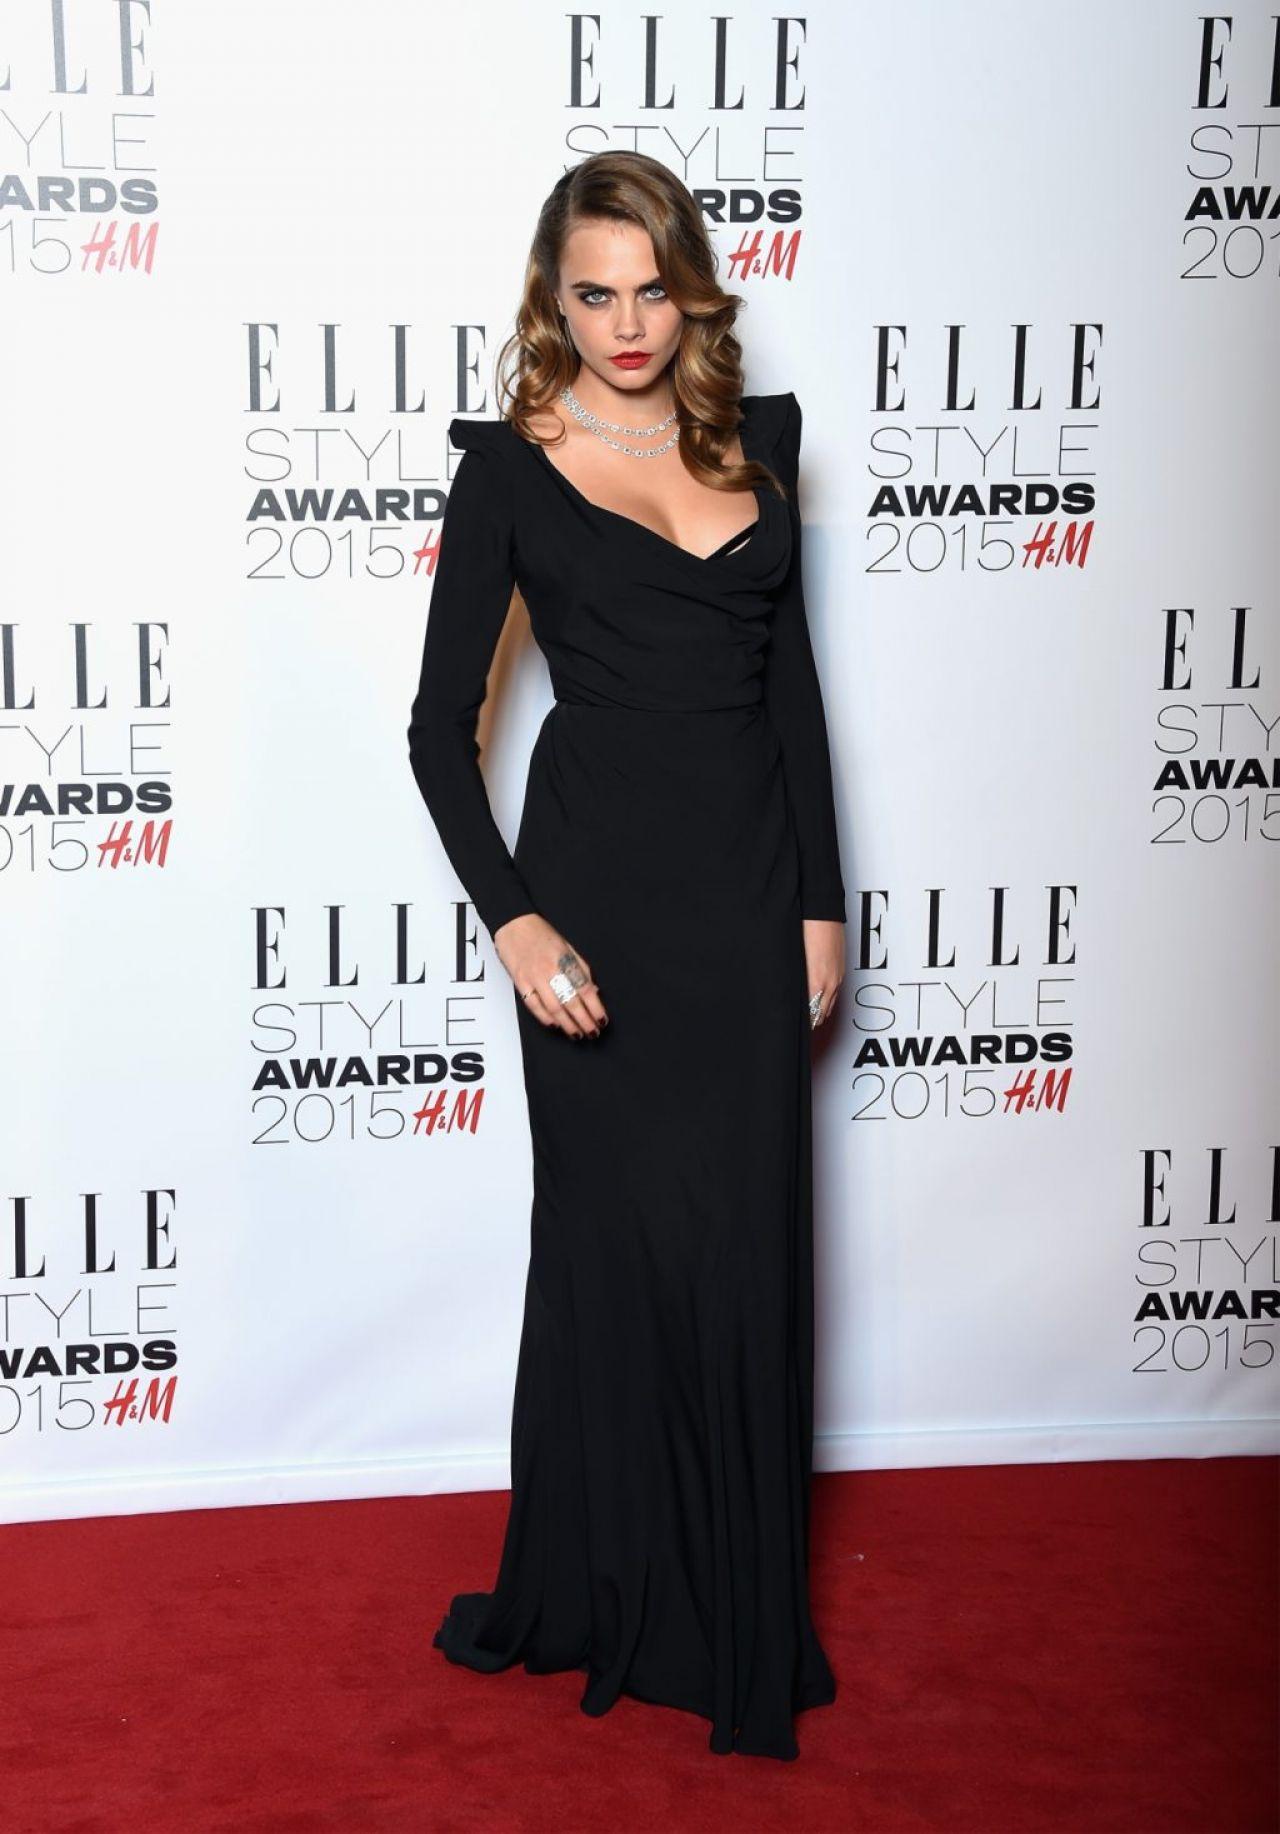 cara-delevingne-2015-elle-style-awards-in-london_4